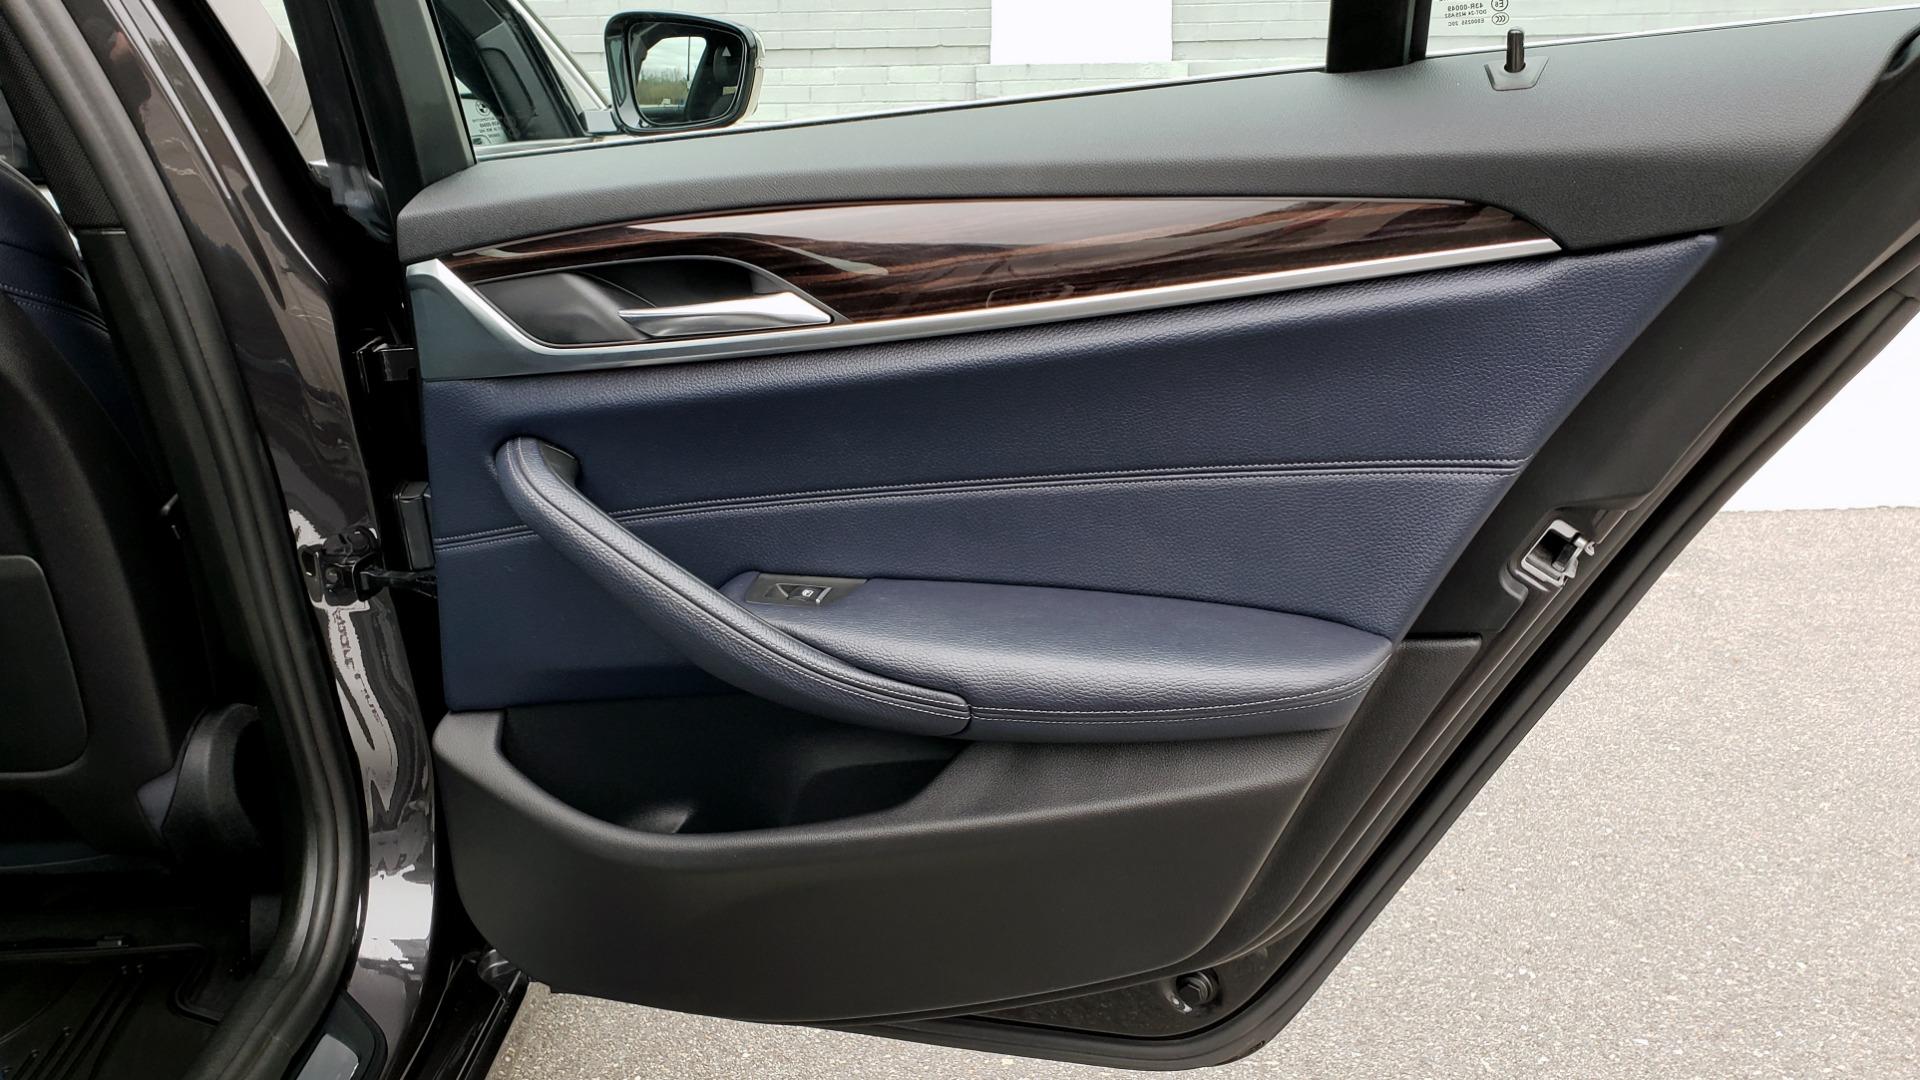 Used 2017 BMW 5 SERIES 530IXDRIVE / PREM PKG / DRVR ASST PLUS / CLD WTHR / APPLE CARPLAY for sale $30,595 at Formula Imports in Charlotte NC 28227 70